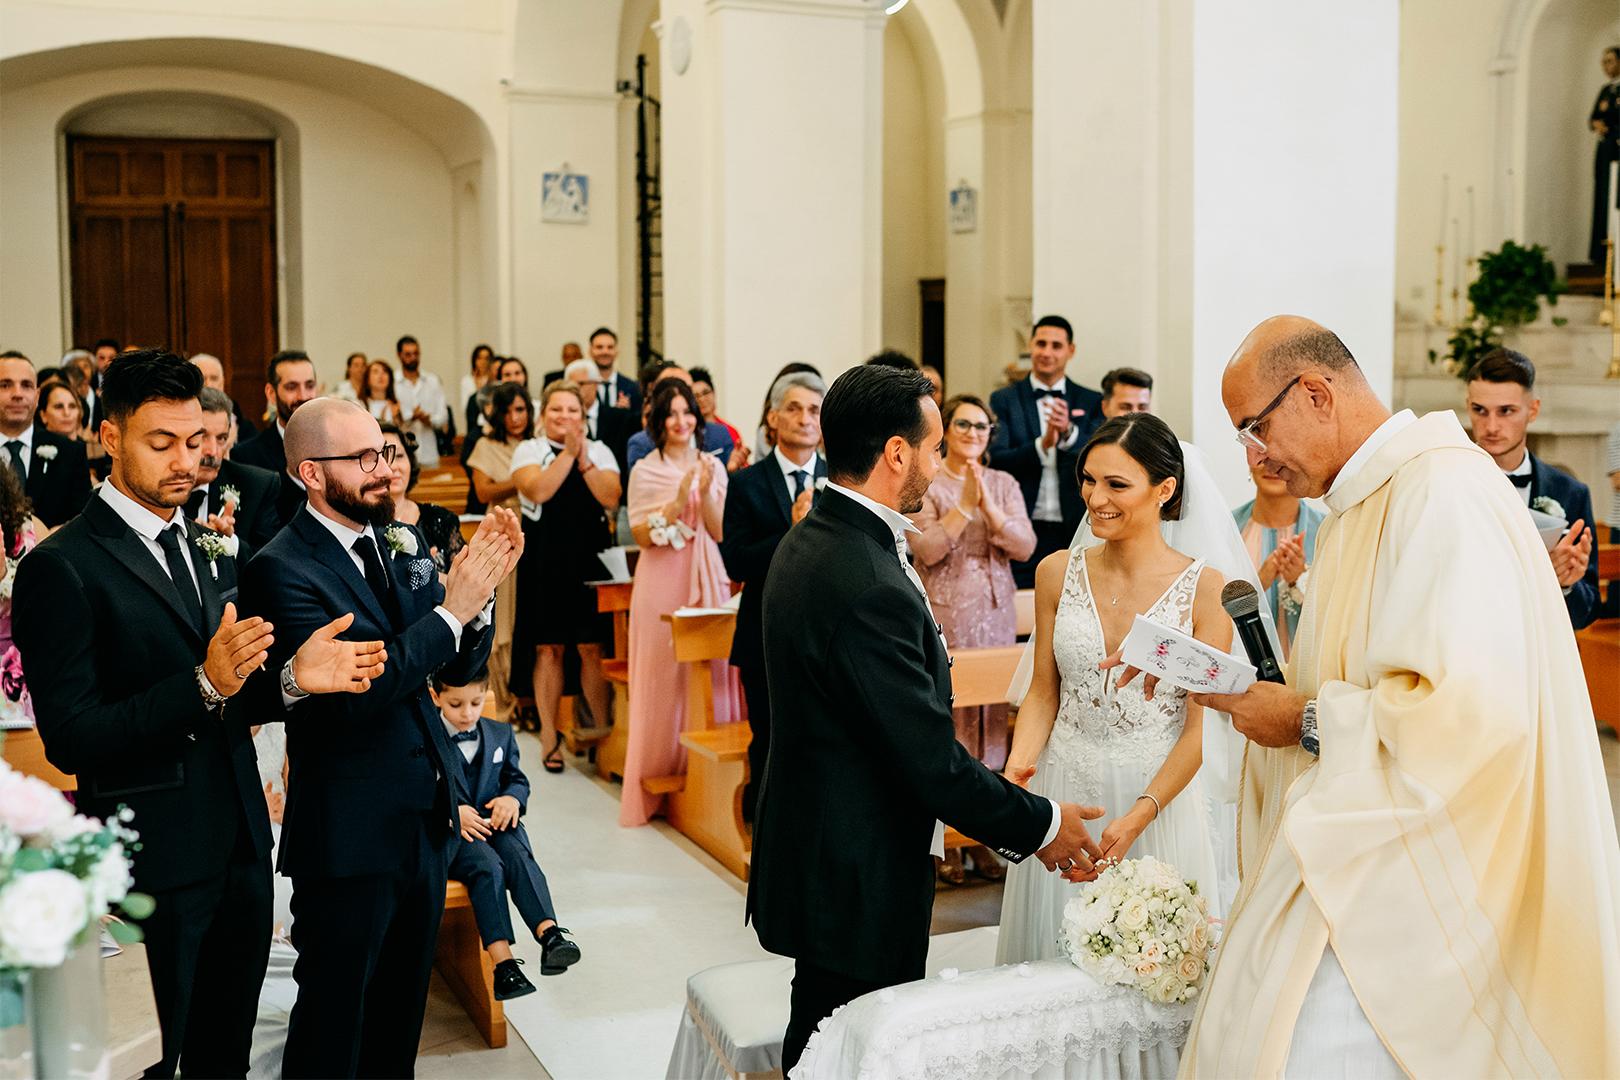 25 gianni-lepore-matrimonio-stornarella-religioso-chiesa